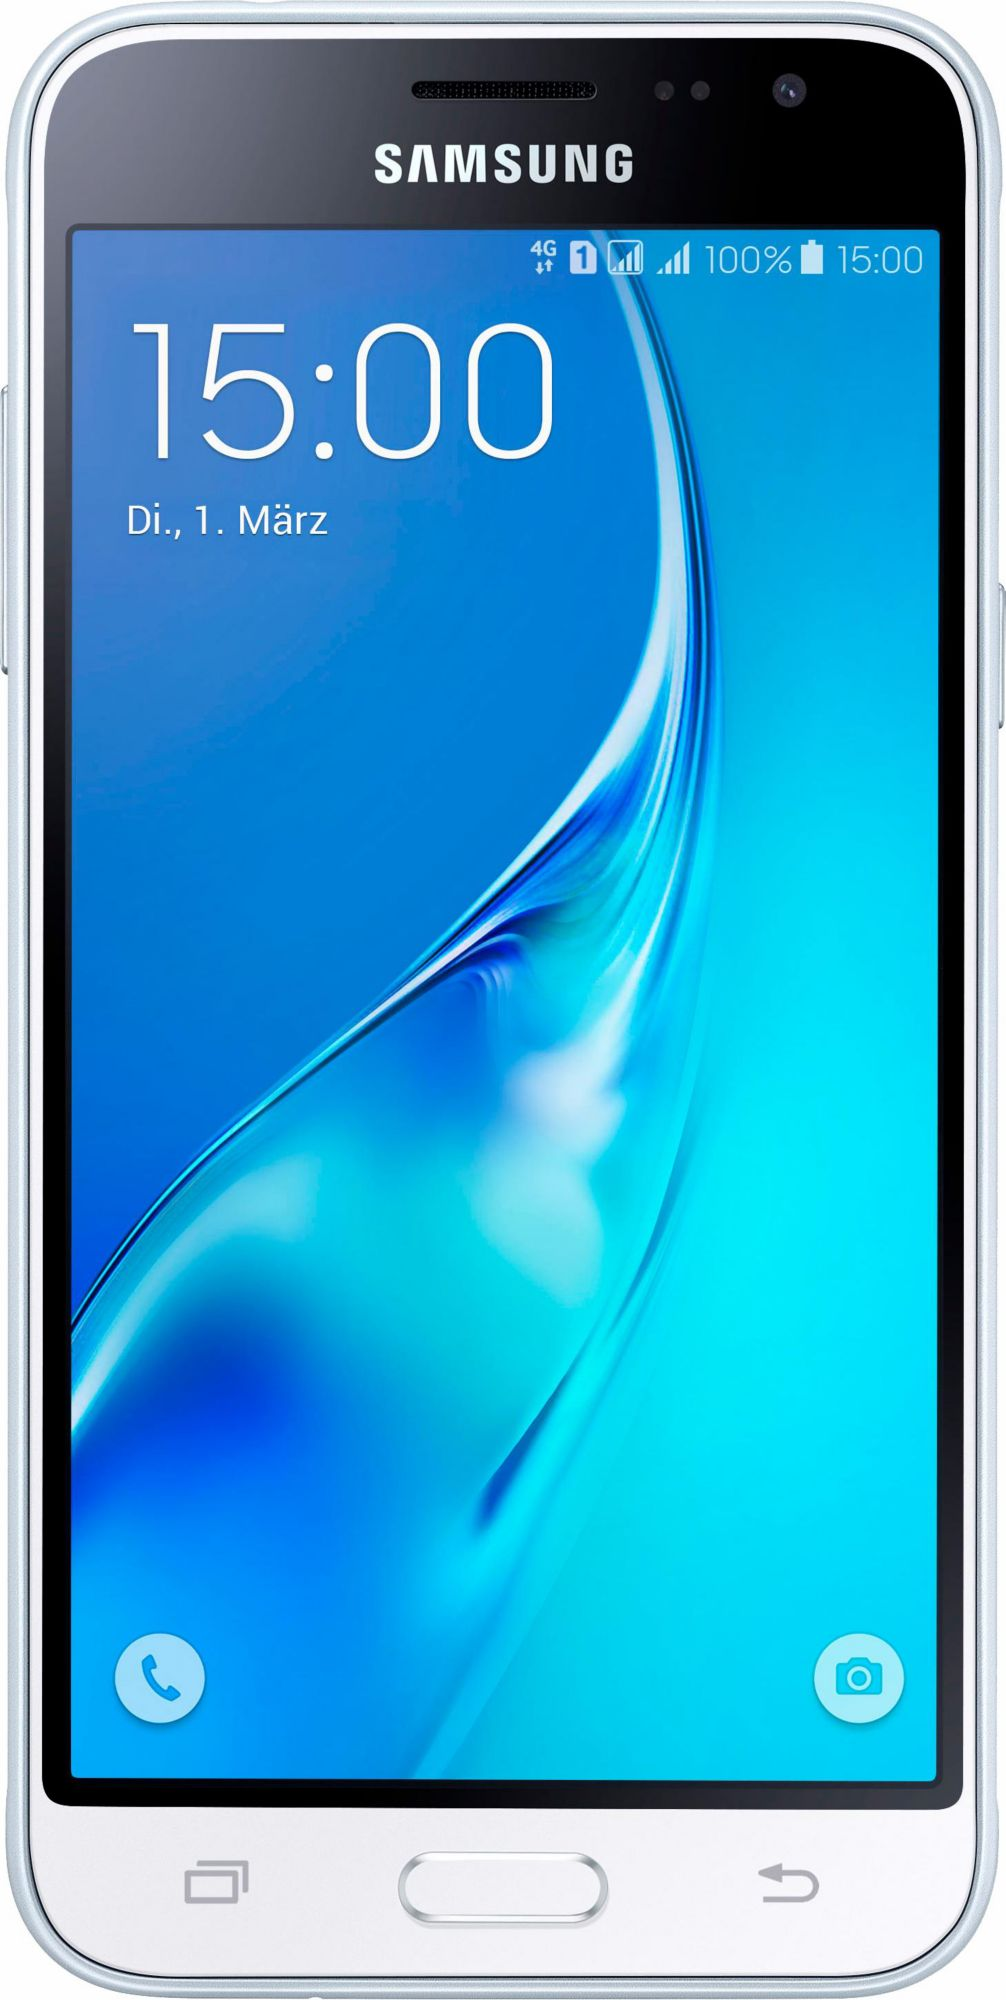 SAMSUNG .Samsung GALAXY J3 (2016) Duos J320FD weiß Android Smartphone